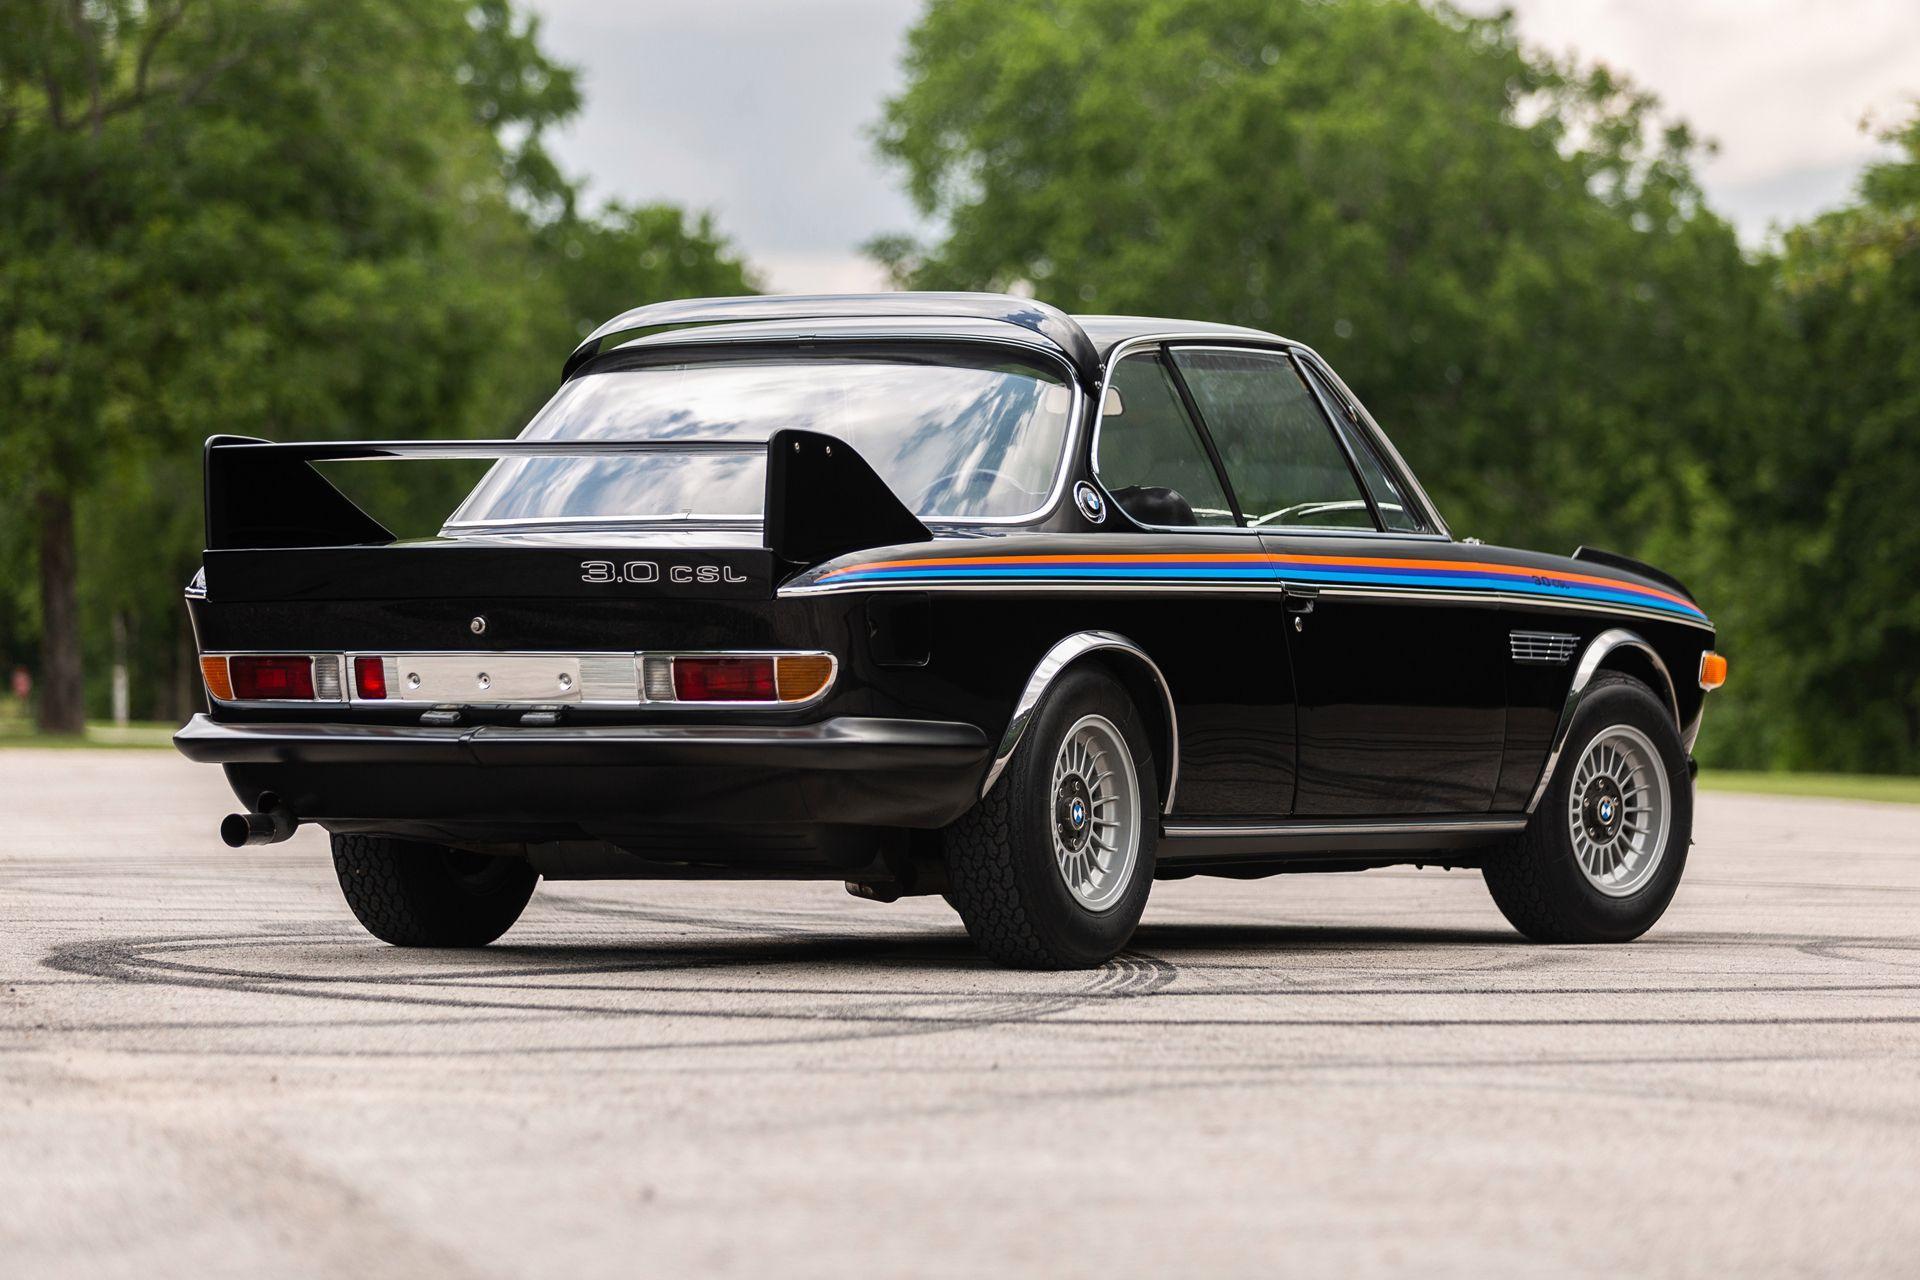 BMW-3.0-CSL-4